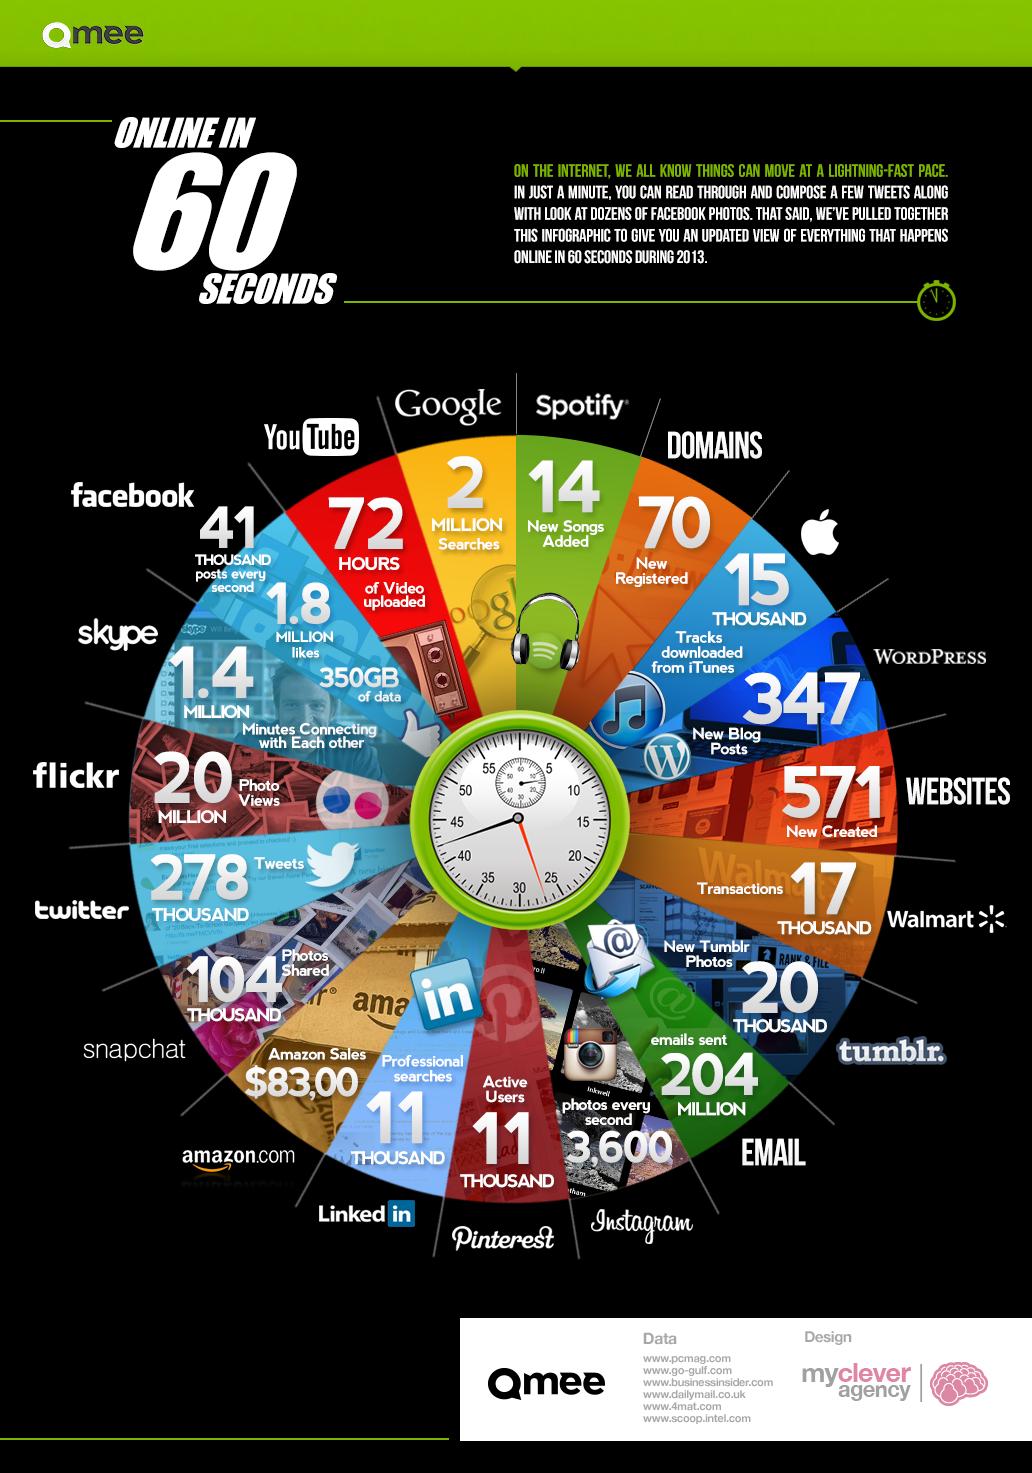 Amazing Things Happen Online in 60 Seconds